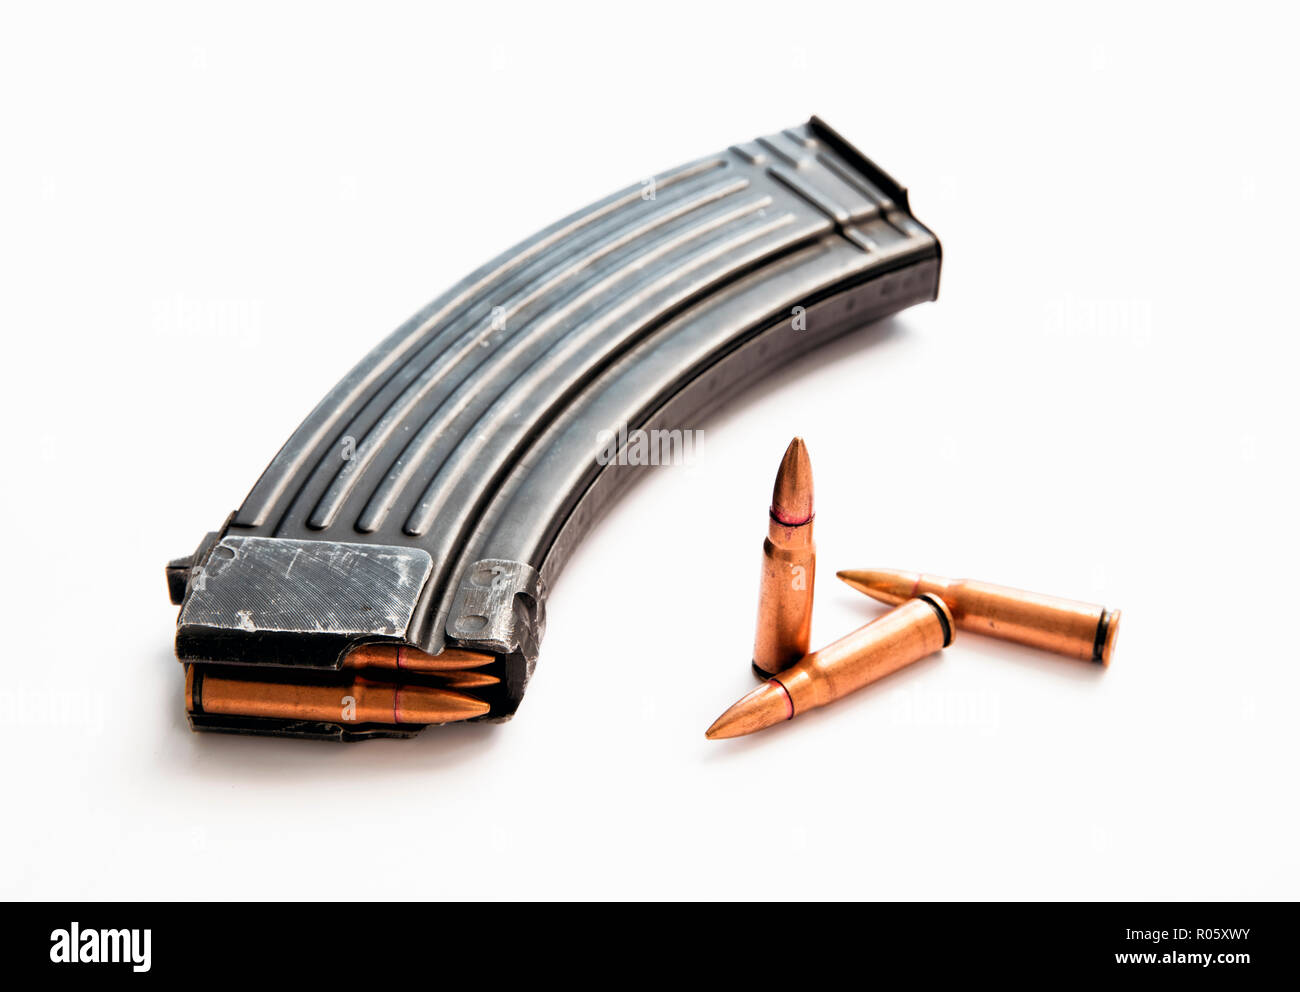 High capacity assault rifle magazine with live ammunition - Stock Image